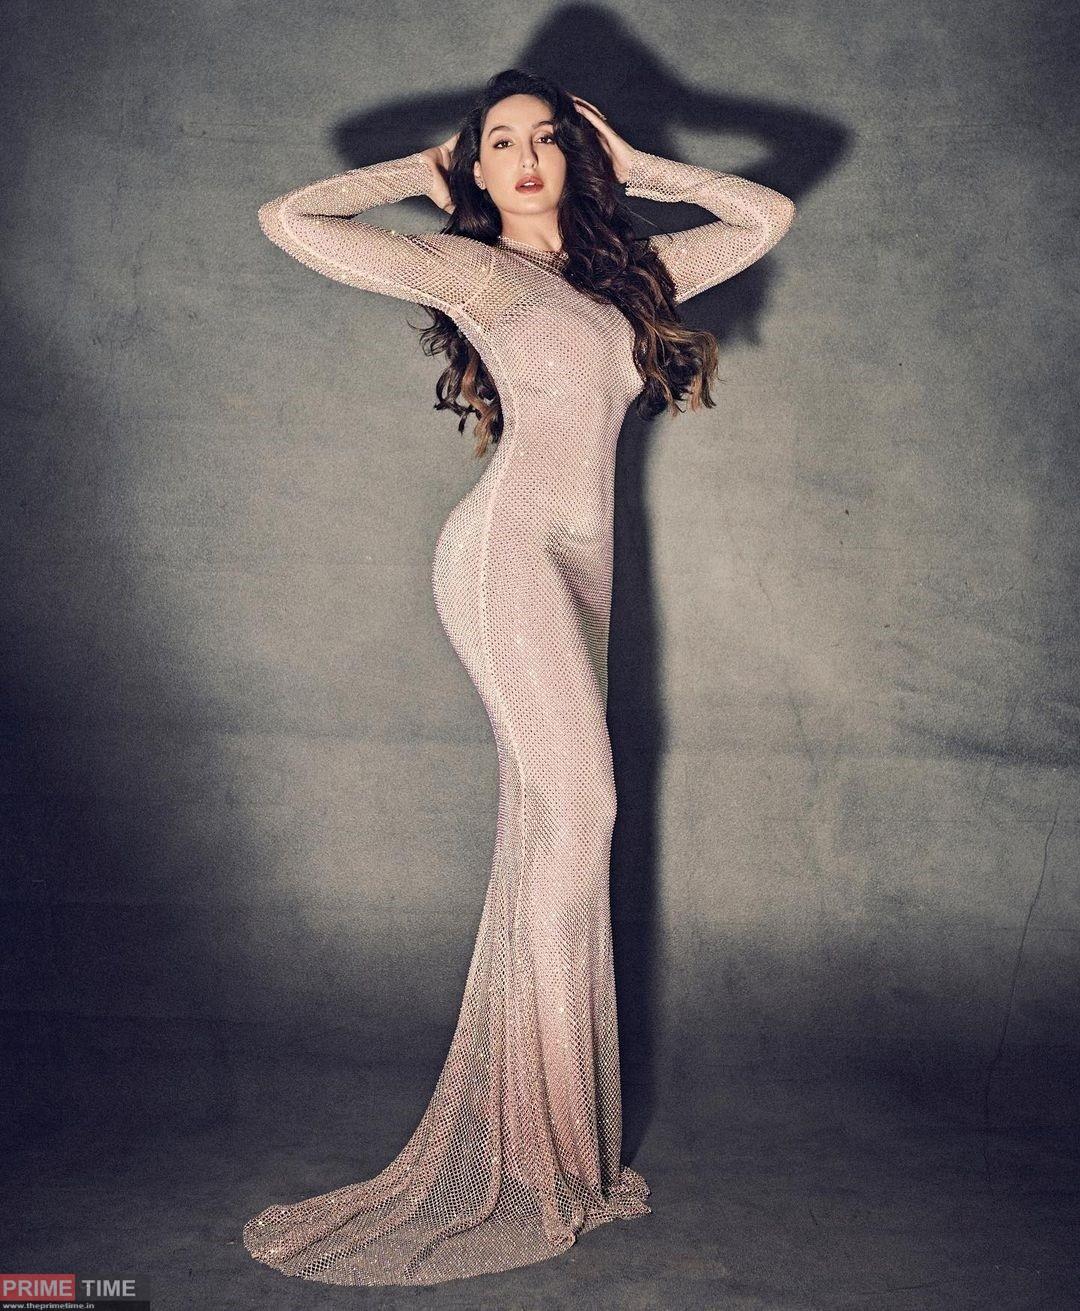 Nora Fatehi gets a stylish photoshoot